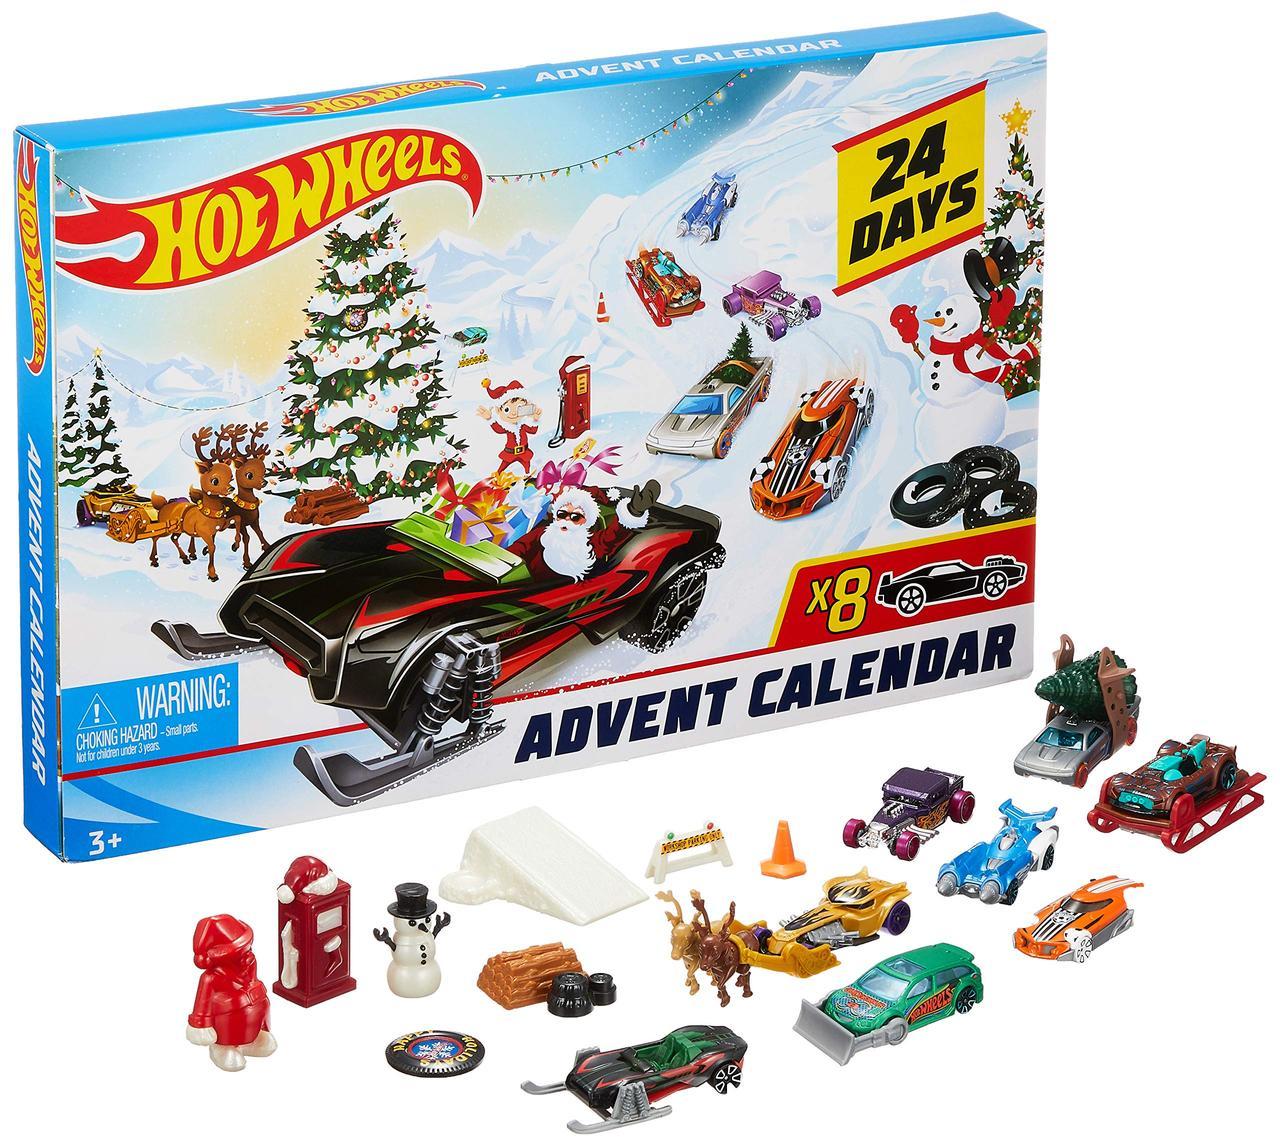 Різдвяний календар Hot Wheels 2019. Новогодний Адвент календарь Хот Вилс , Hot Wheels рождественский календарь